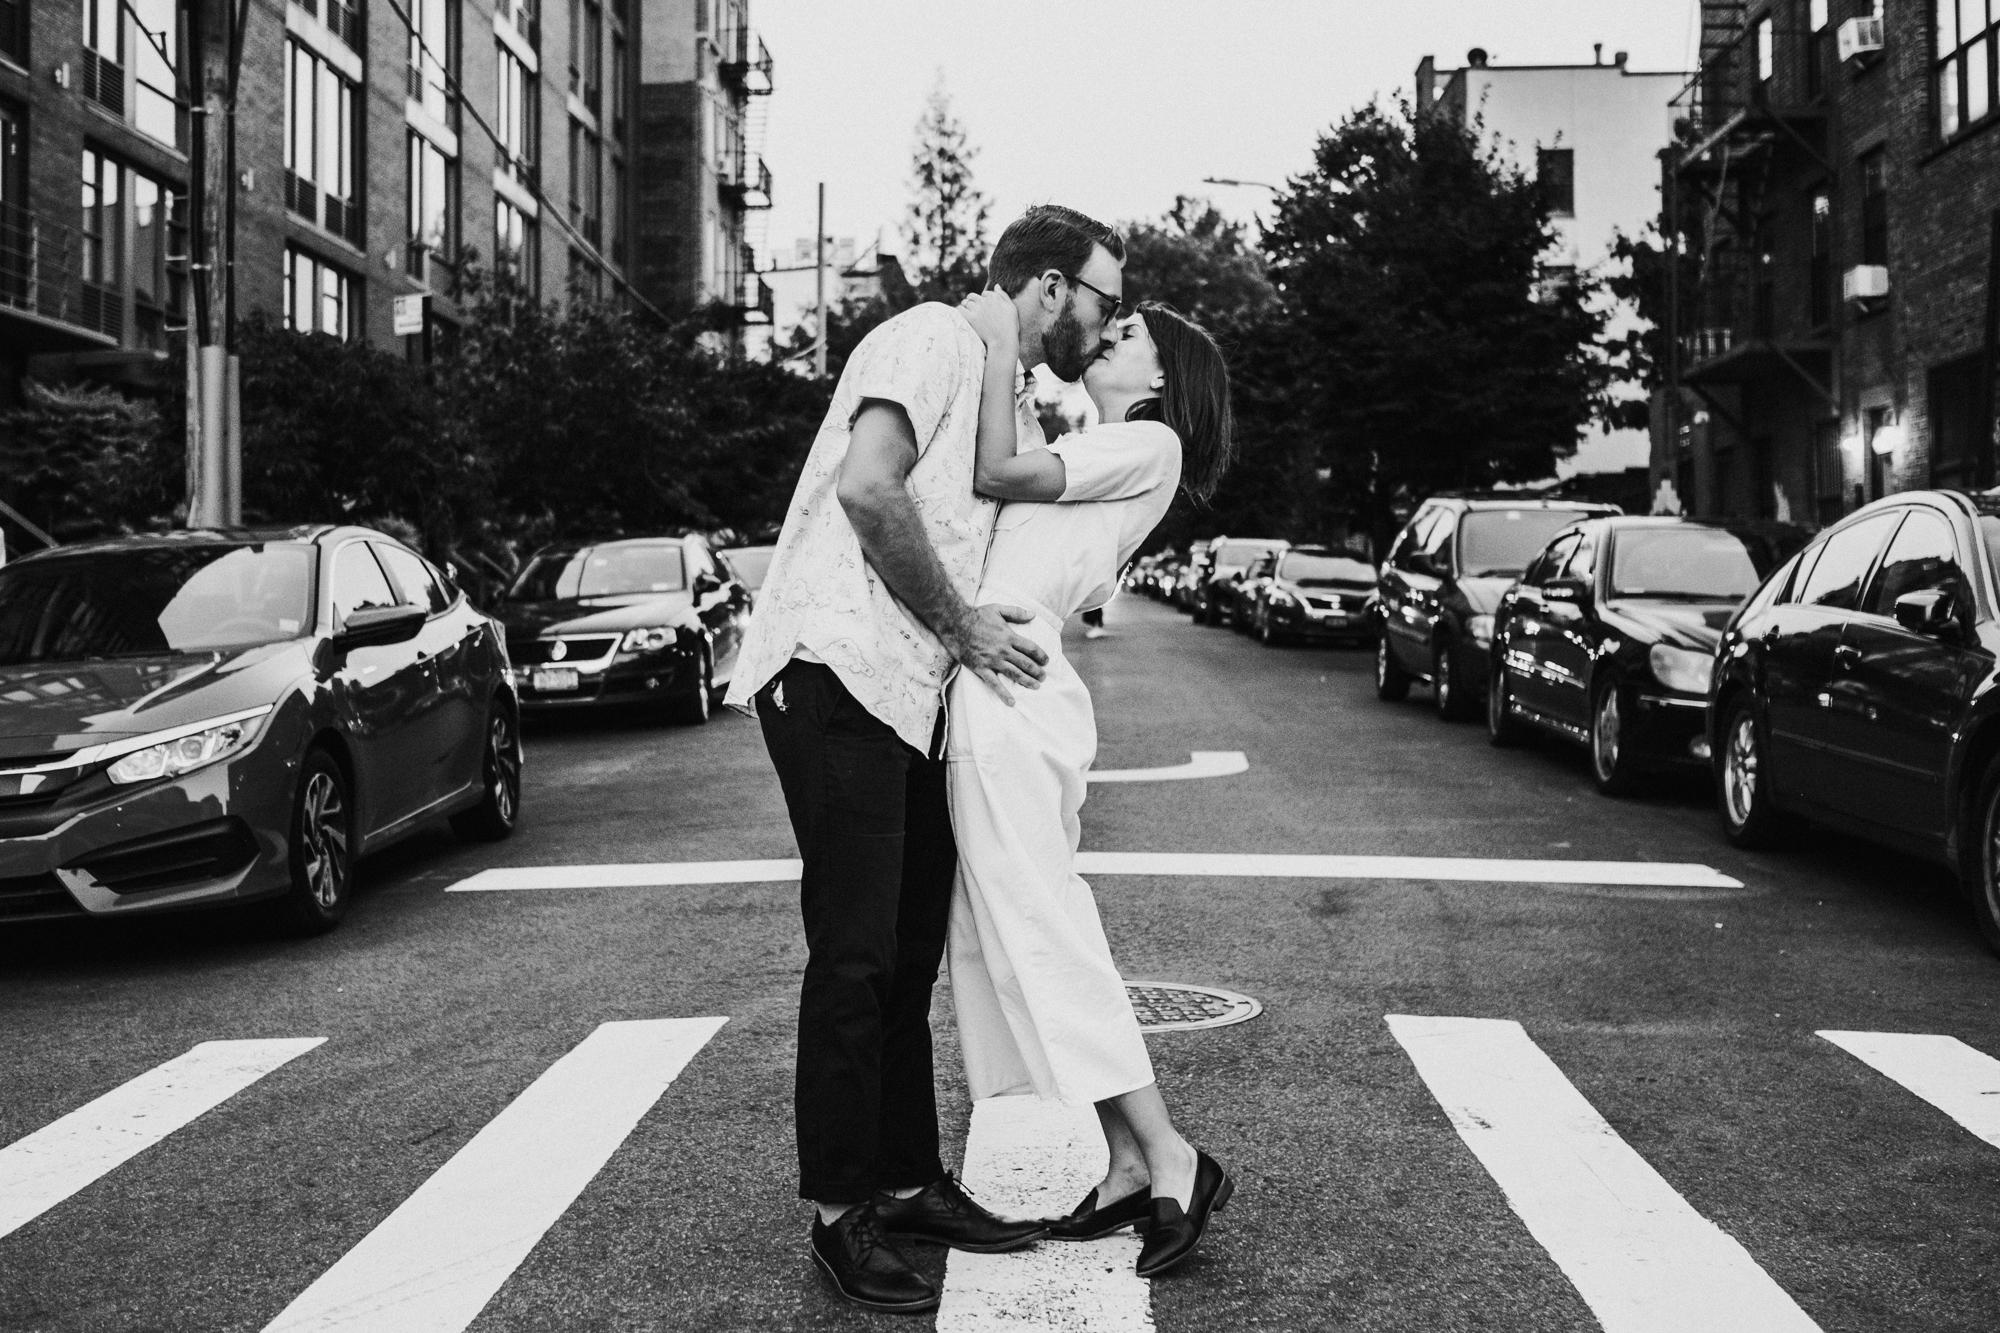 Wedding_Francis_Boucher_Photography_Brooklyn_engagement_2018-57.jpg